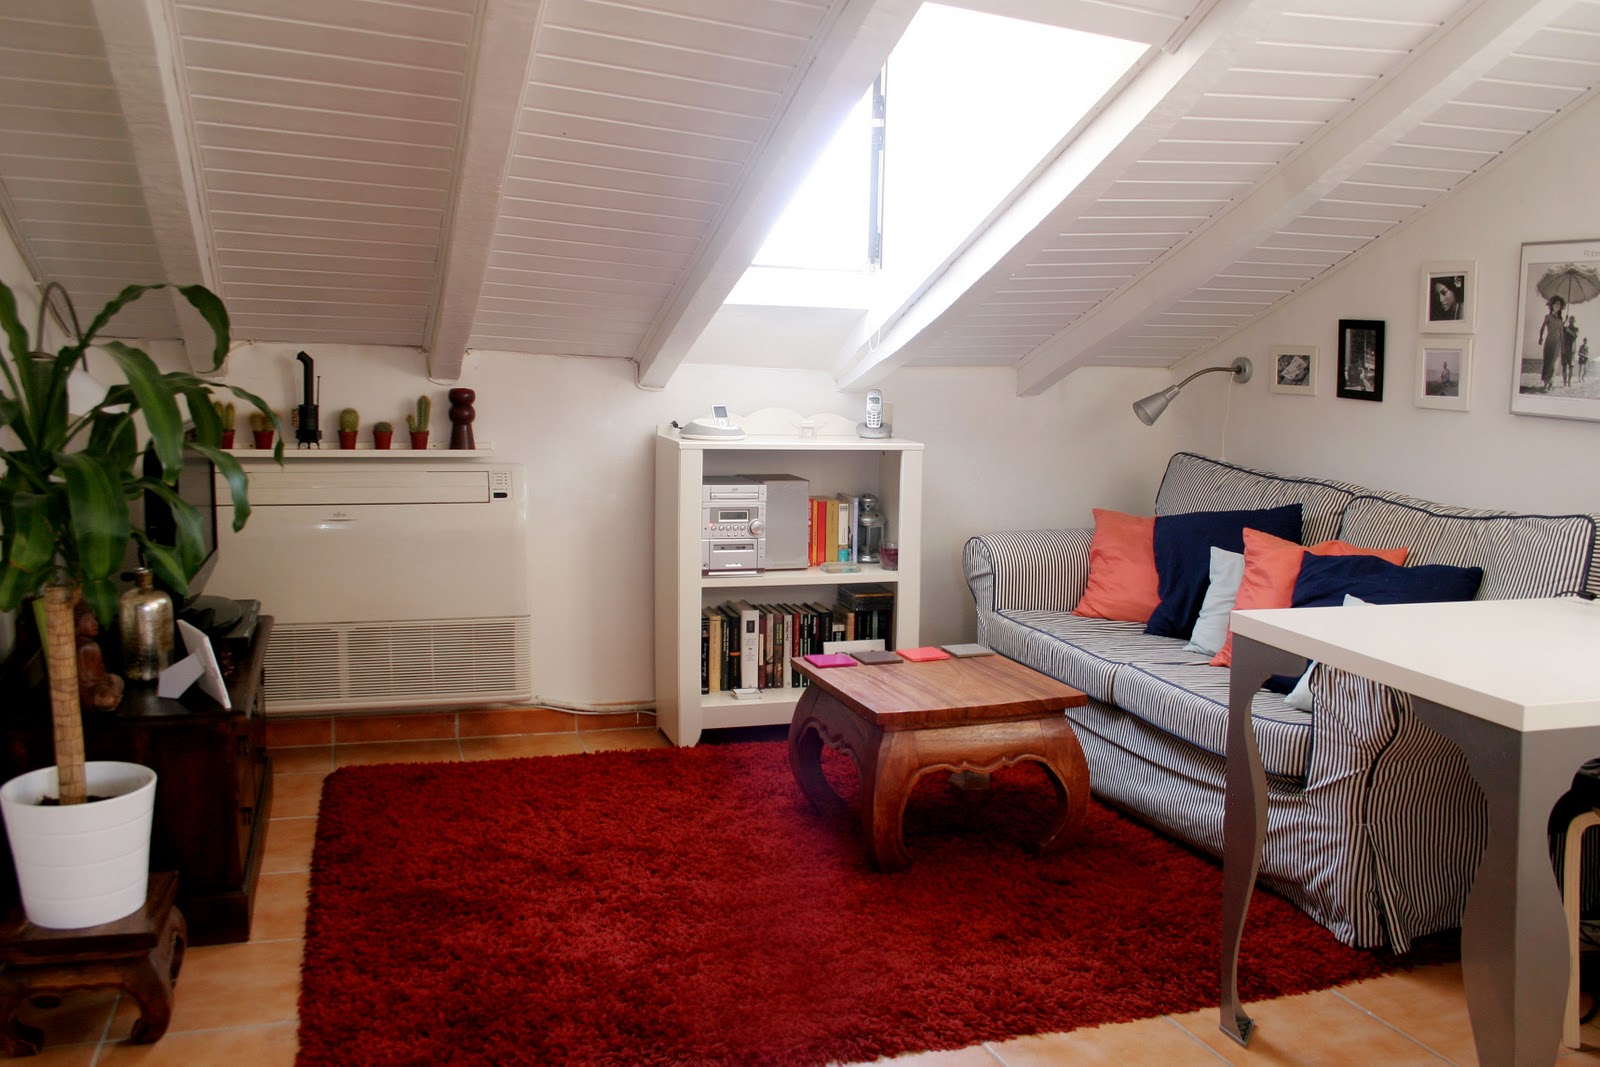 La casa abuhardillada de mirasens44 for Consejos decorar casa